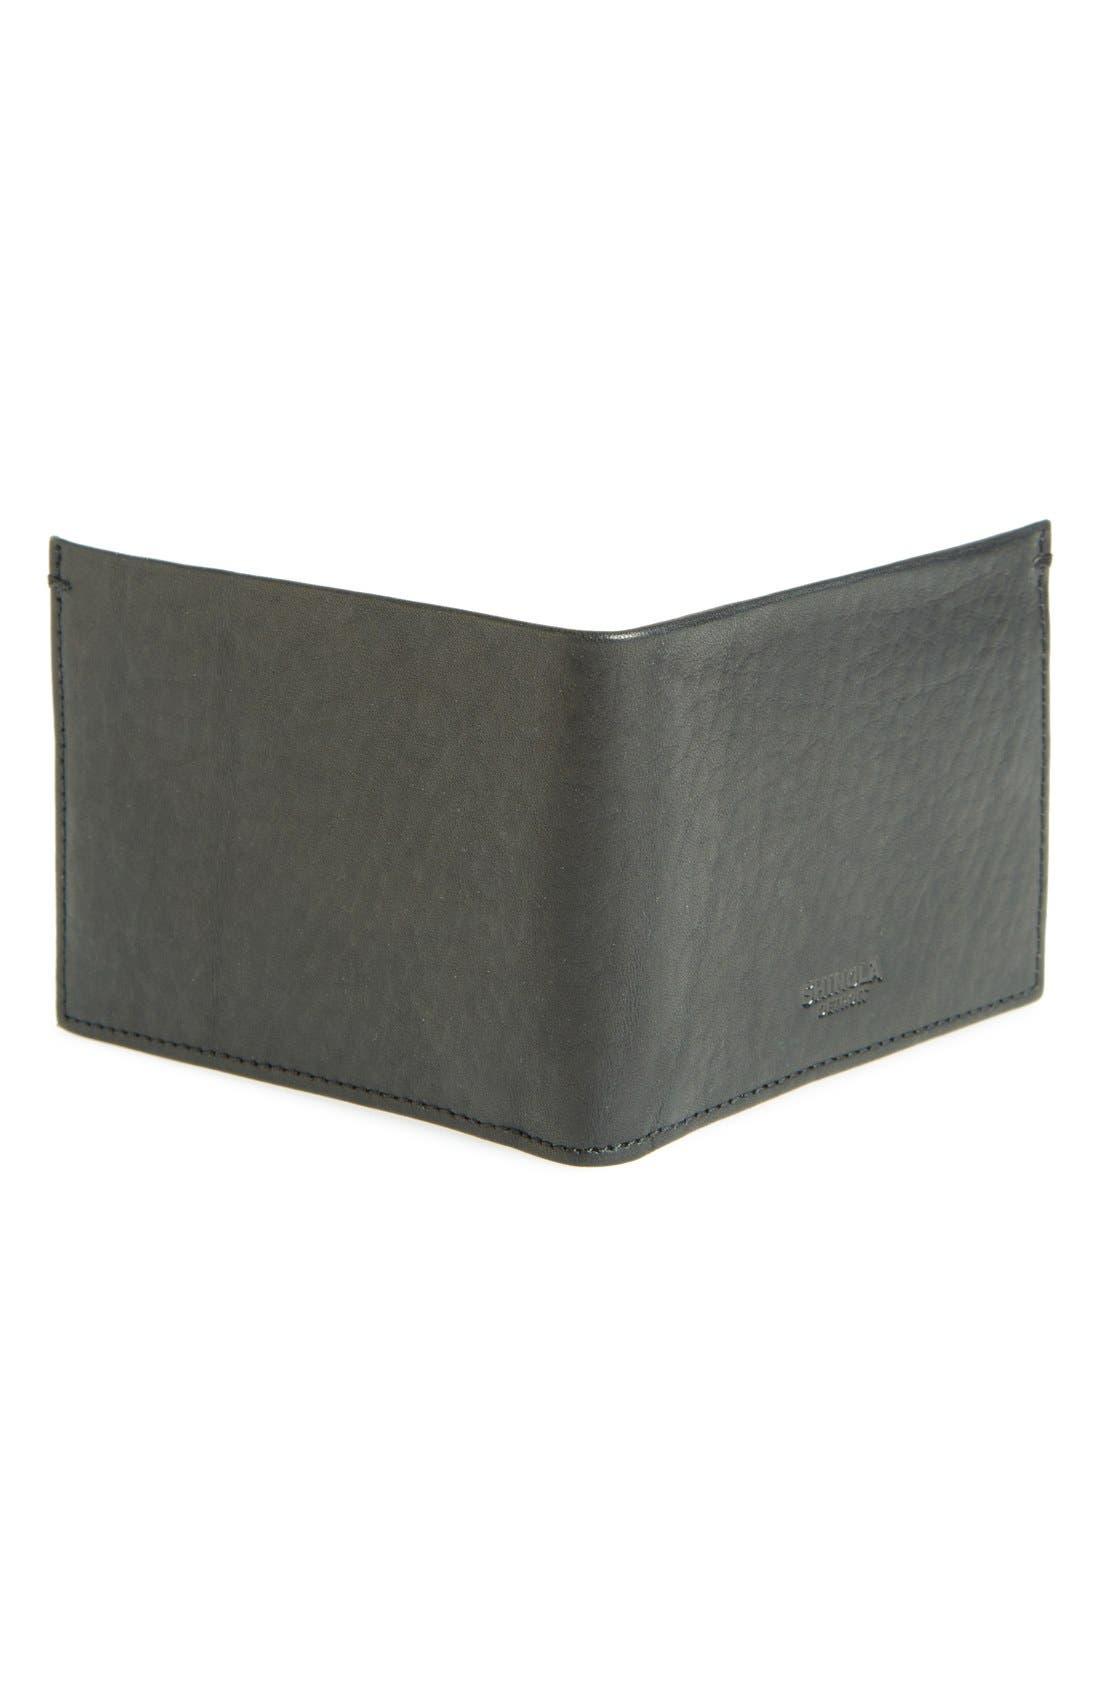 Slim Bifold Leather Wallet,                             Alternate thumbnail 2, color,                             BLACK